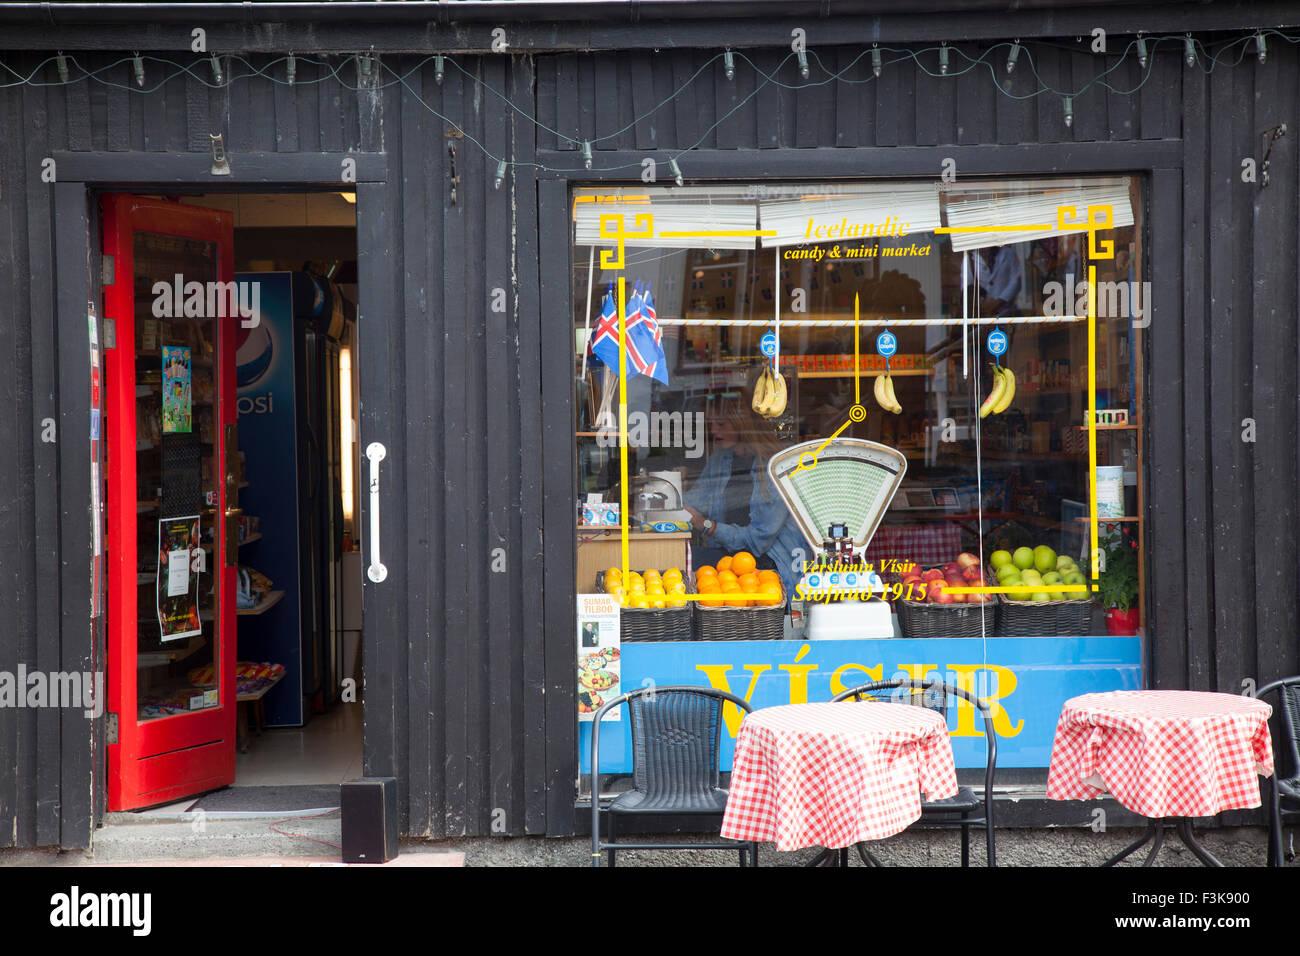 Lebensmittelgeschäft Fassade, Laugavegur, Reykjavik, Island. Stockbild